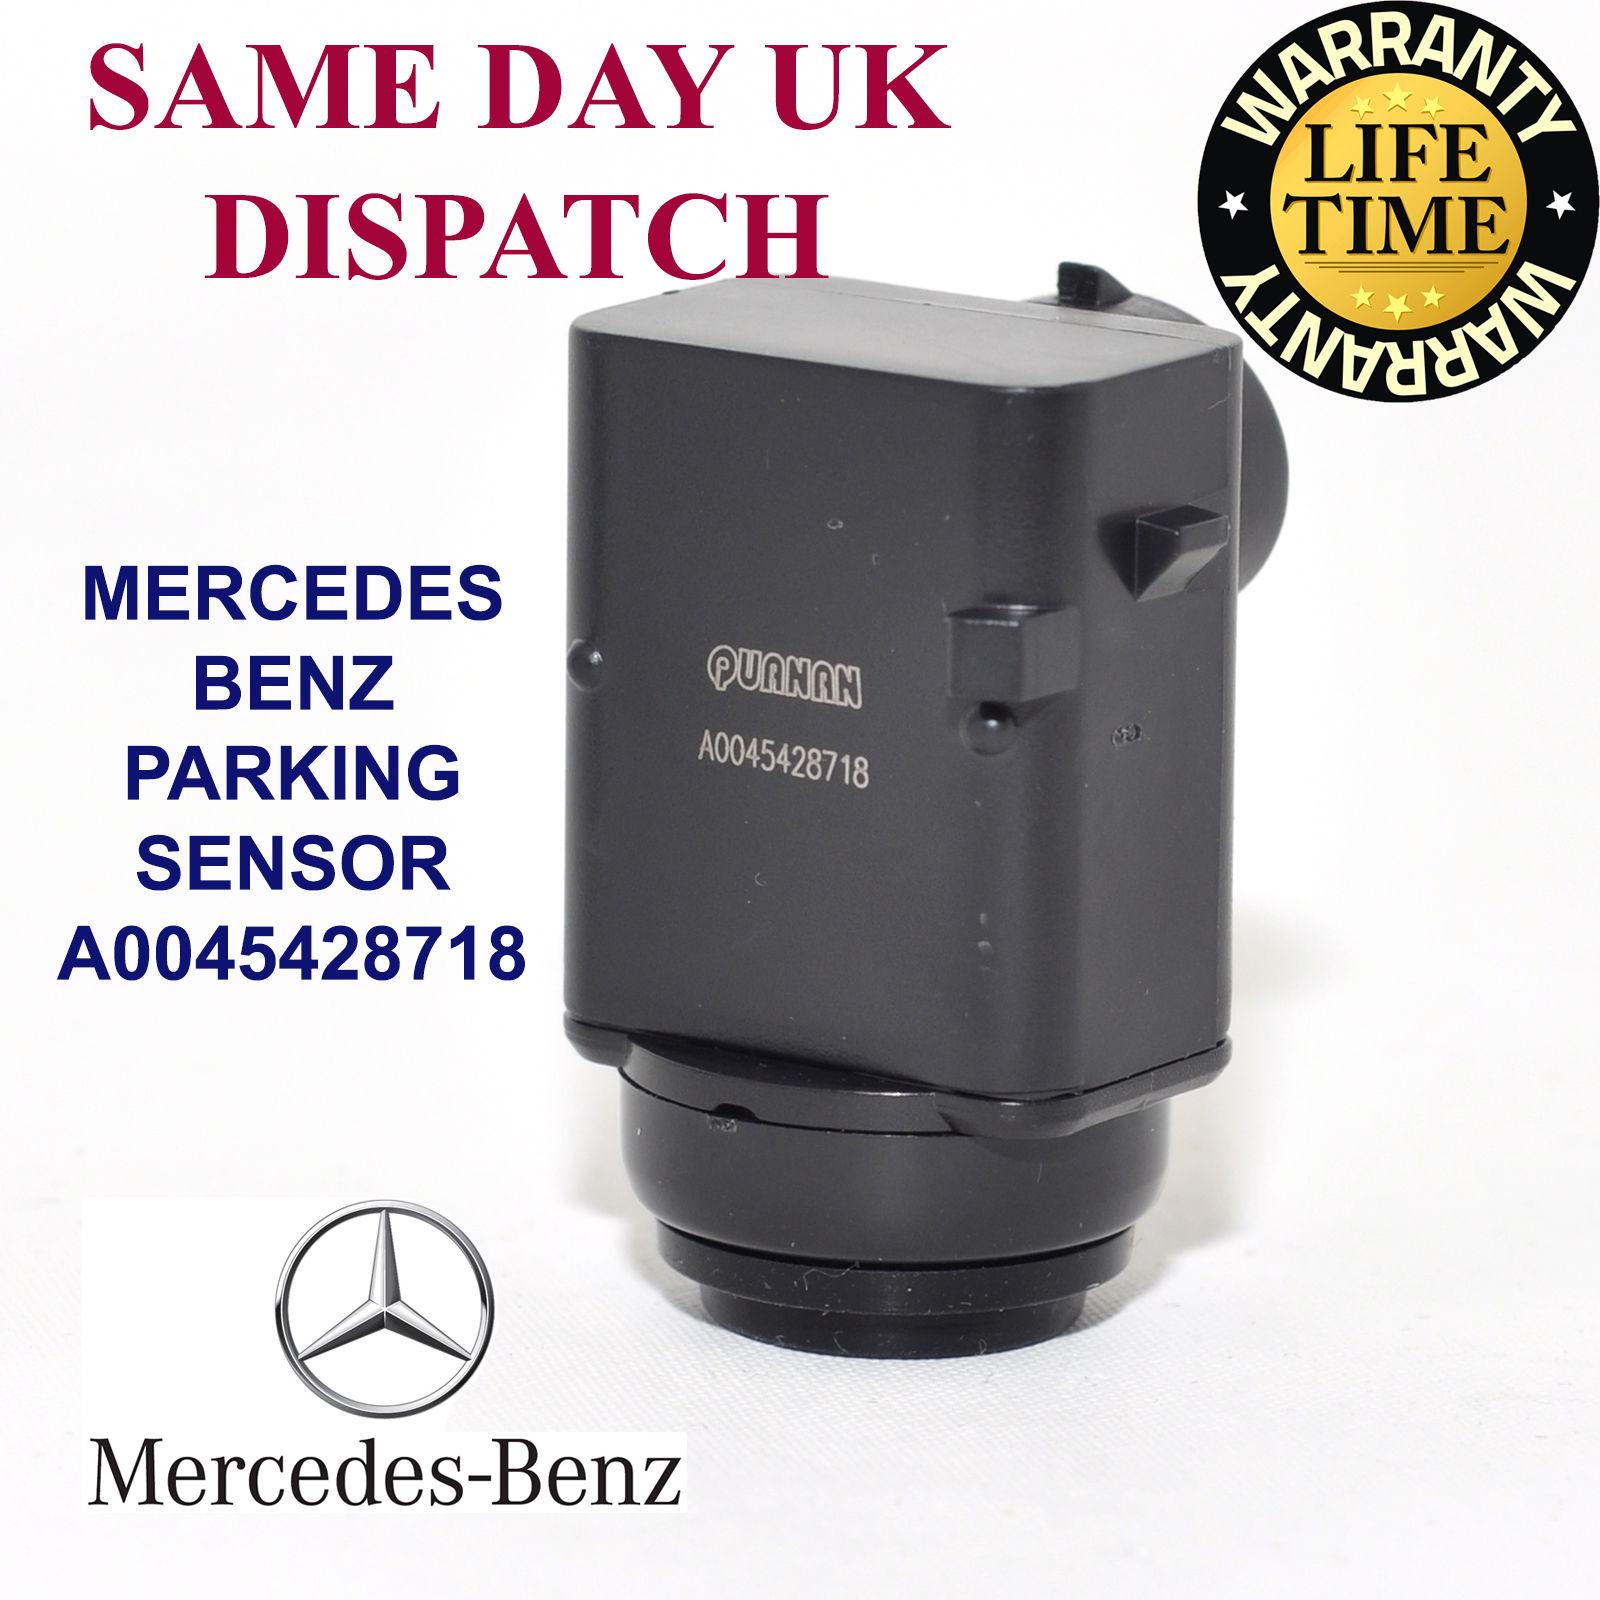 Mercedes benz parking sensor for c cl clk cls gl e a m s for Mercedes benz parking